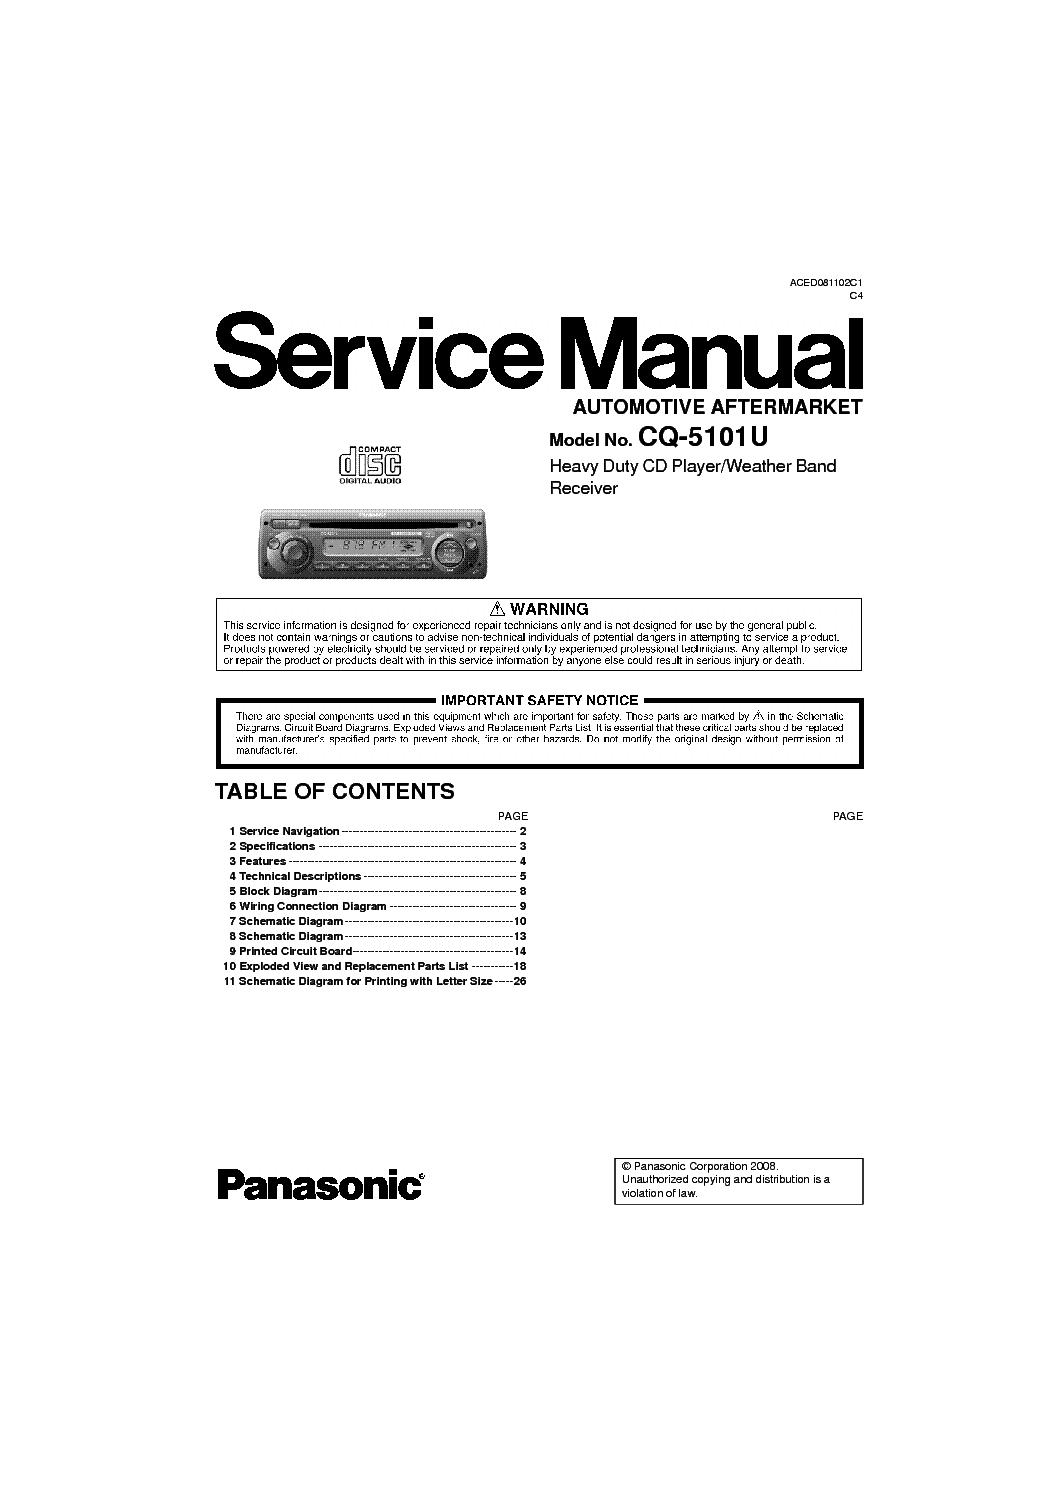 Panasonic Cq Vw100u Wiring Diagram Free Download Aced080107c1 Service Manual Schematics Radio Wire Colors At